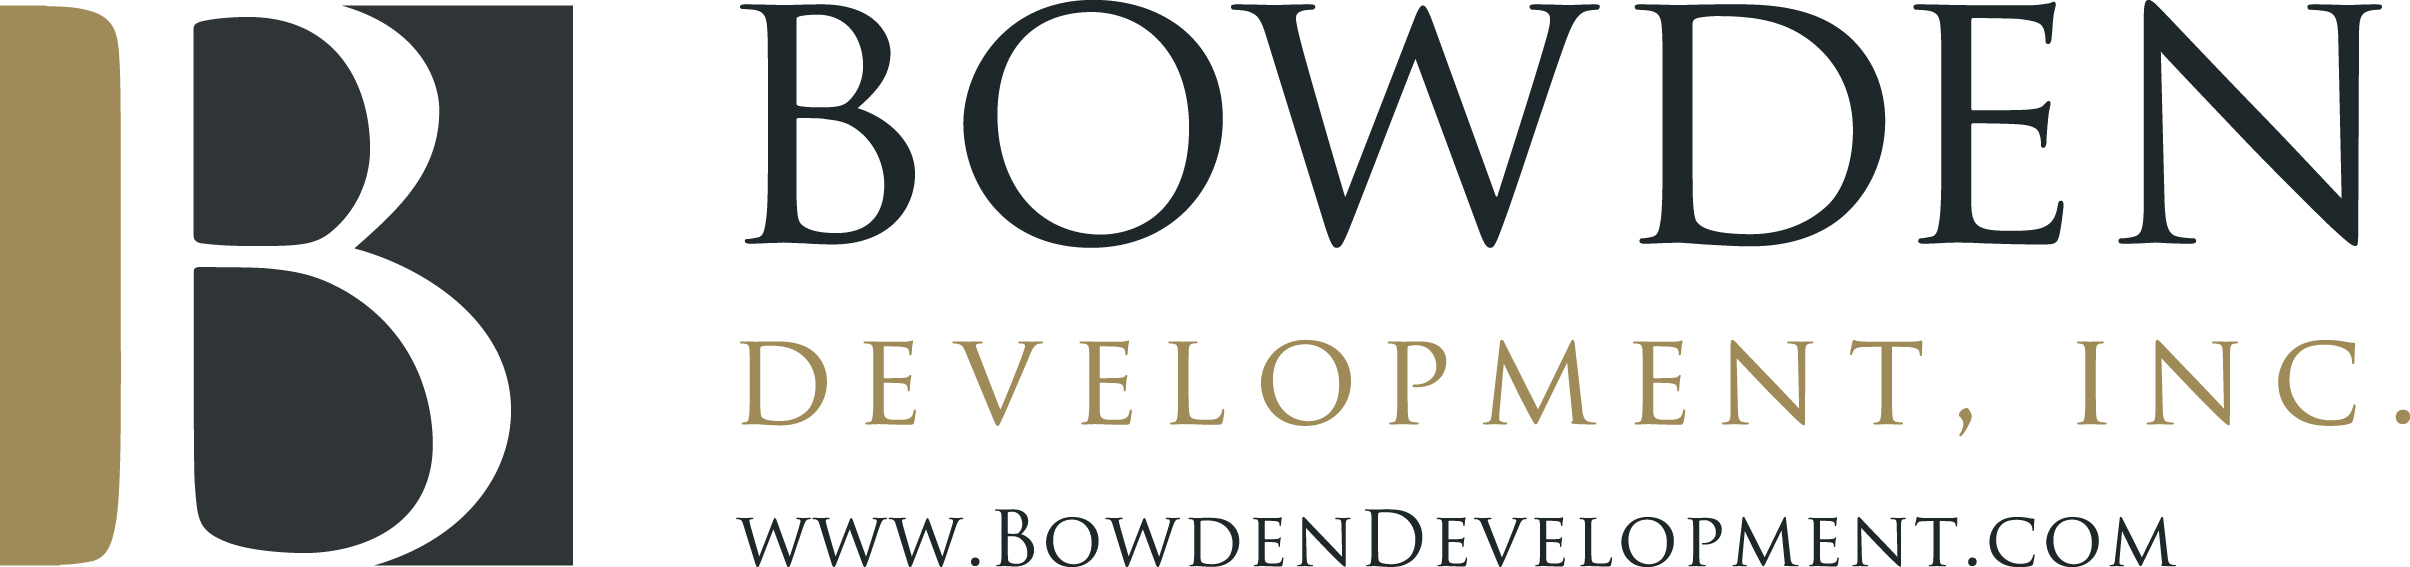 Bowden Development logo